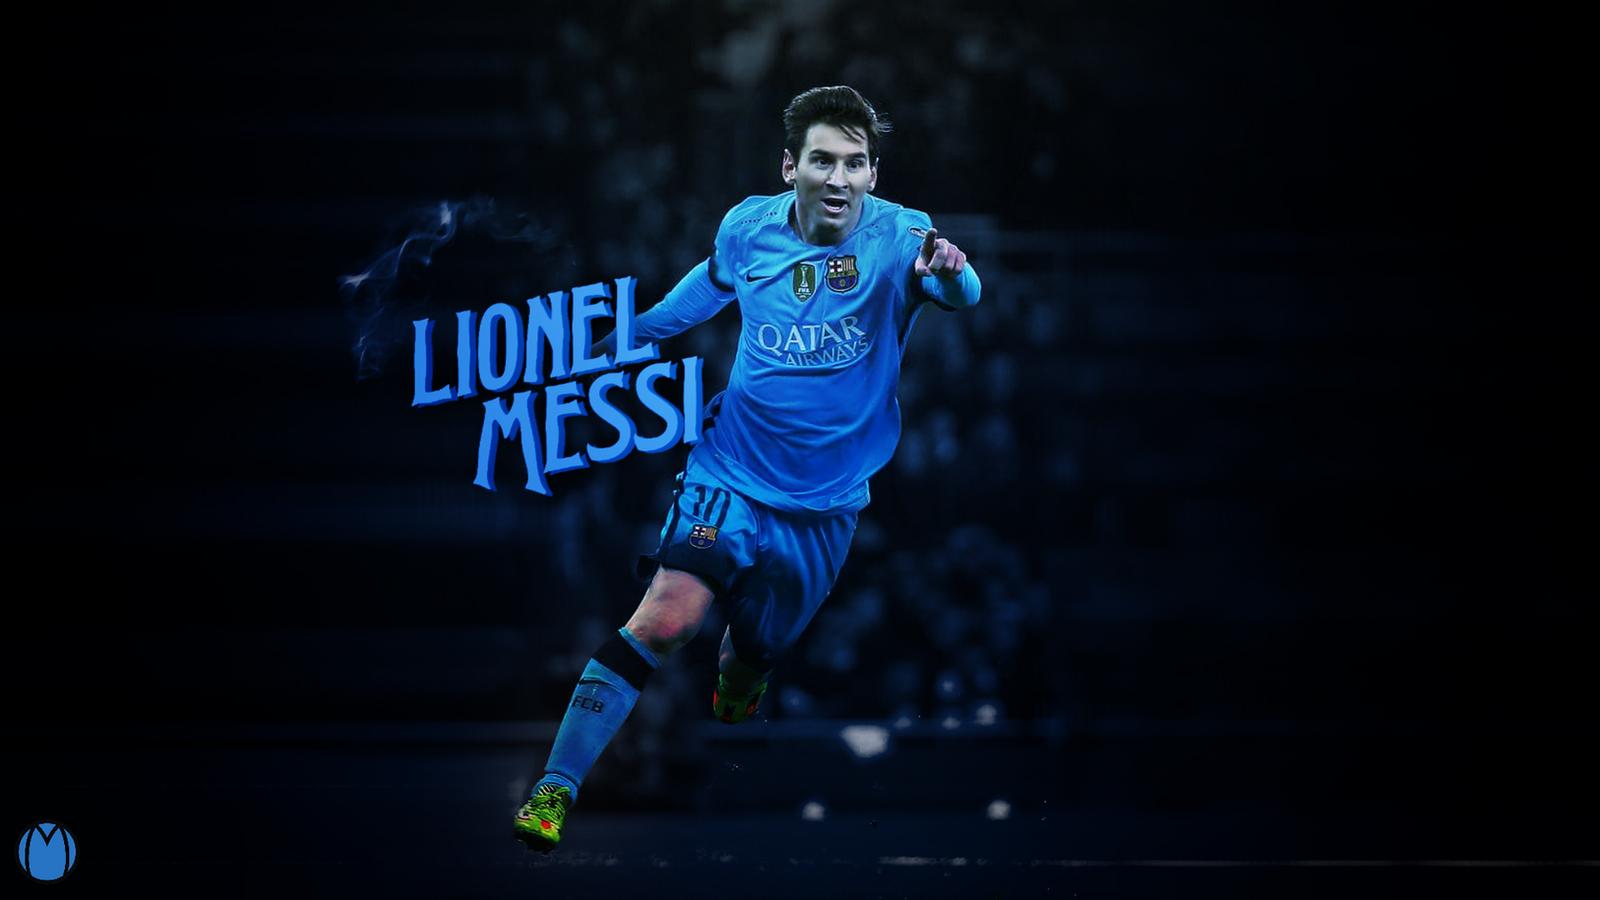 Lionel Messi 2016 Wallpaper